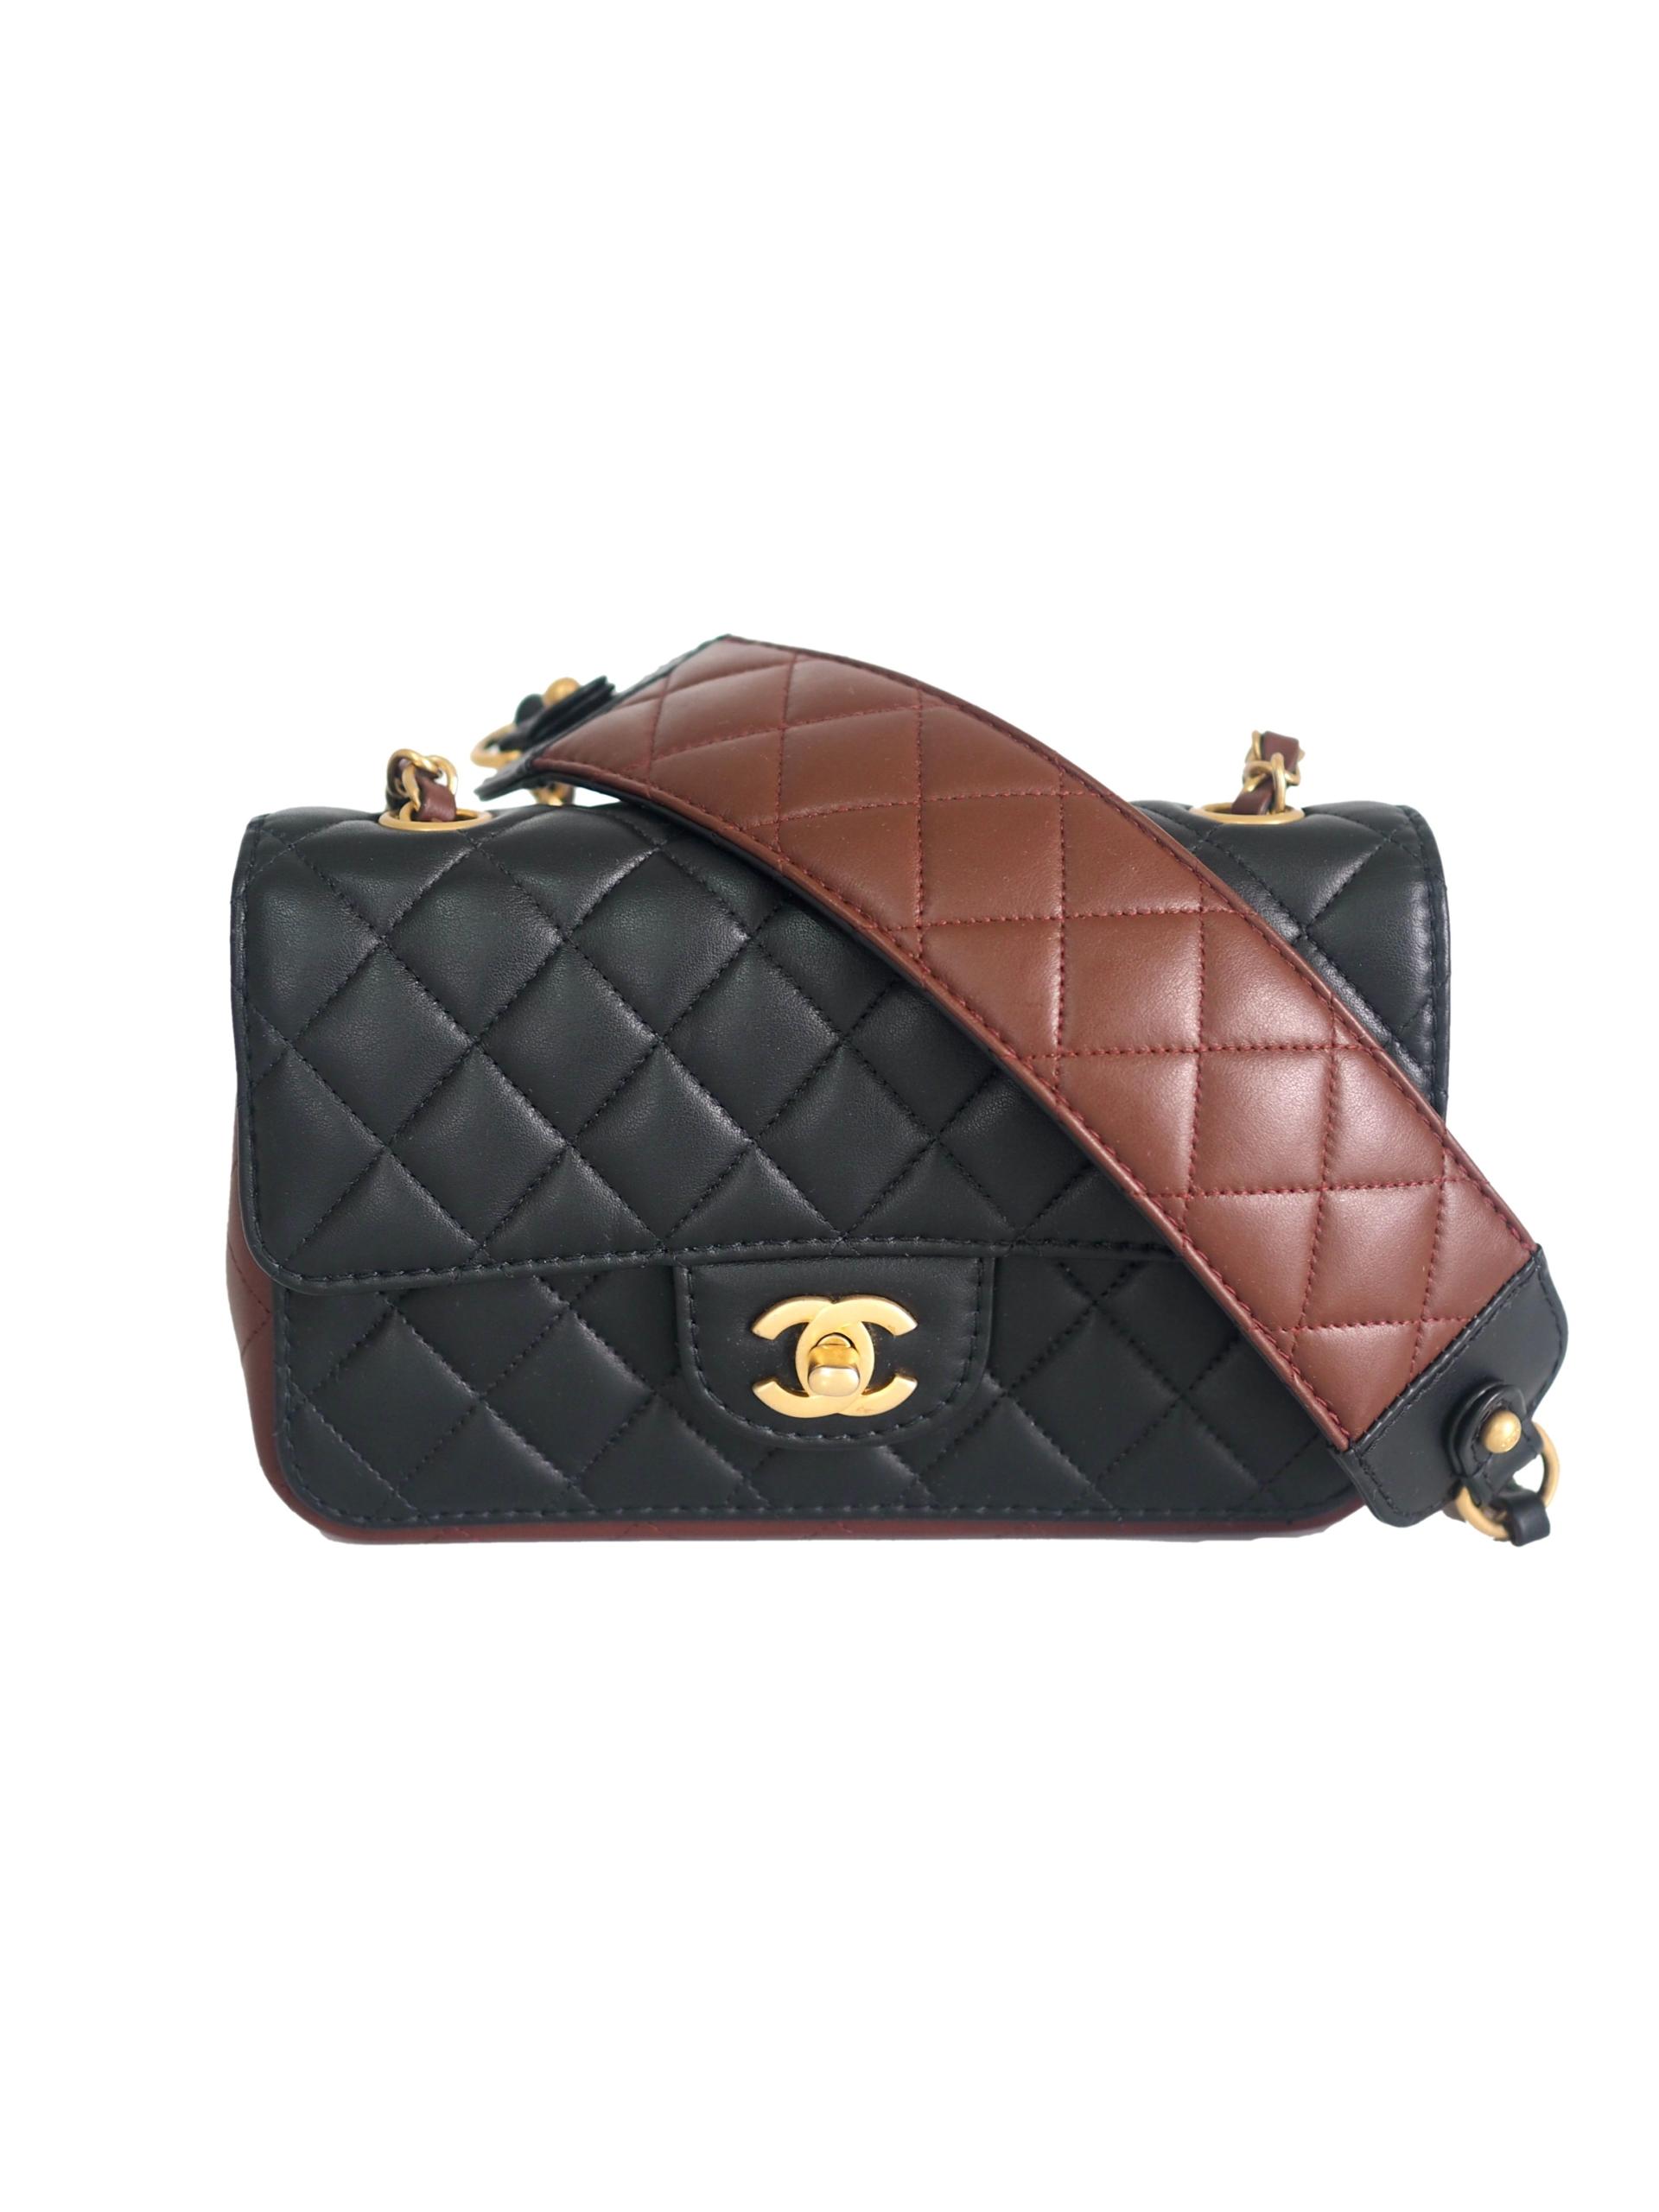 Bag CHANEL Rumway Mini Rectangular Two-tone Lambskin GHW